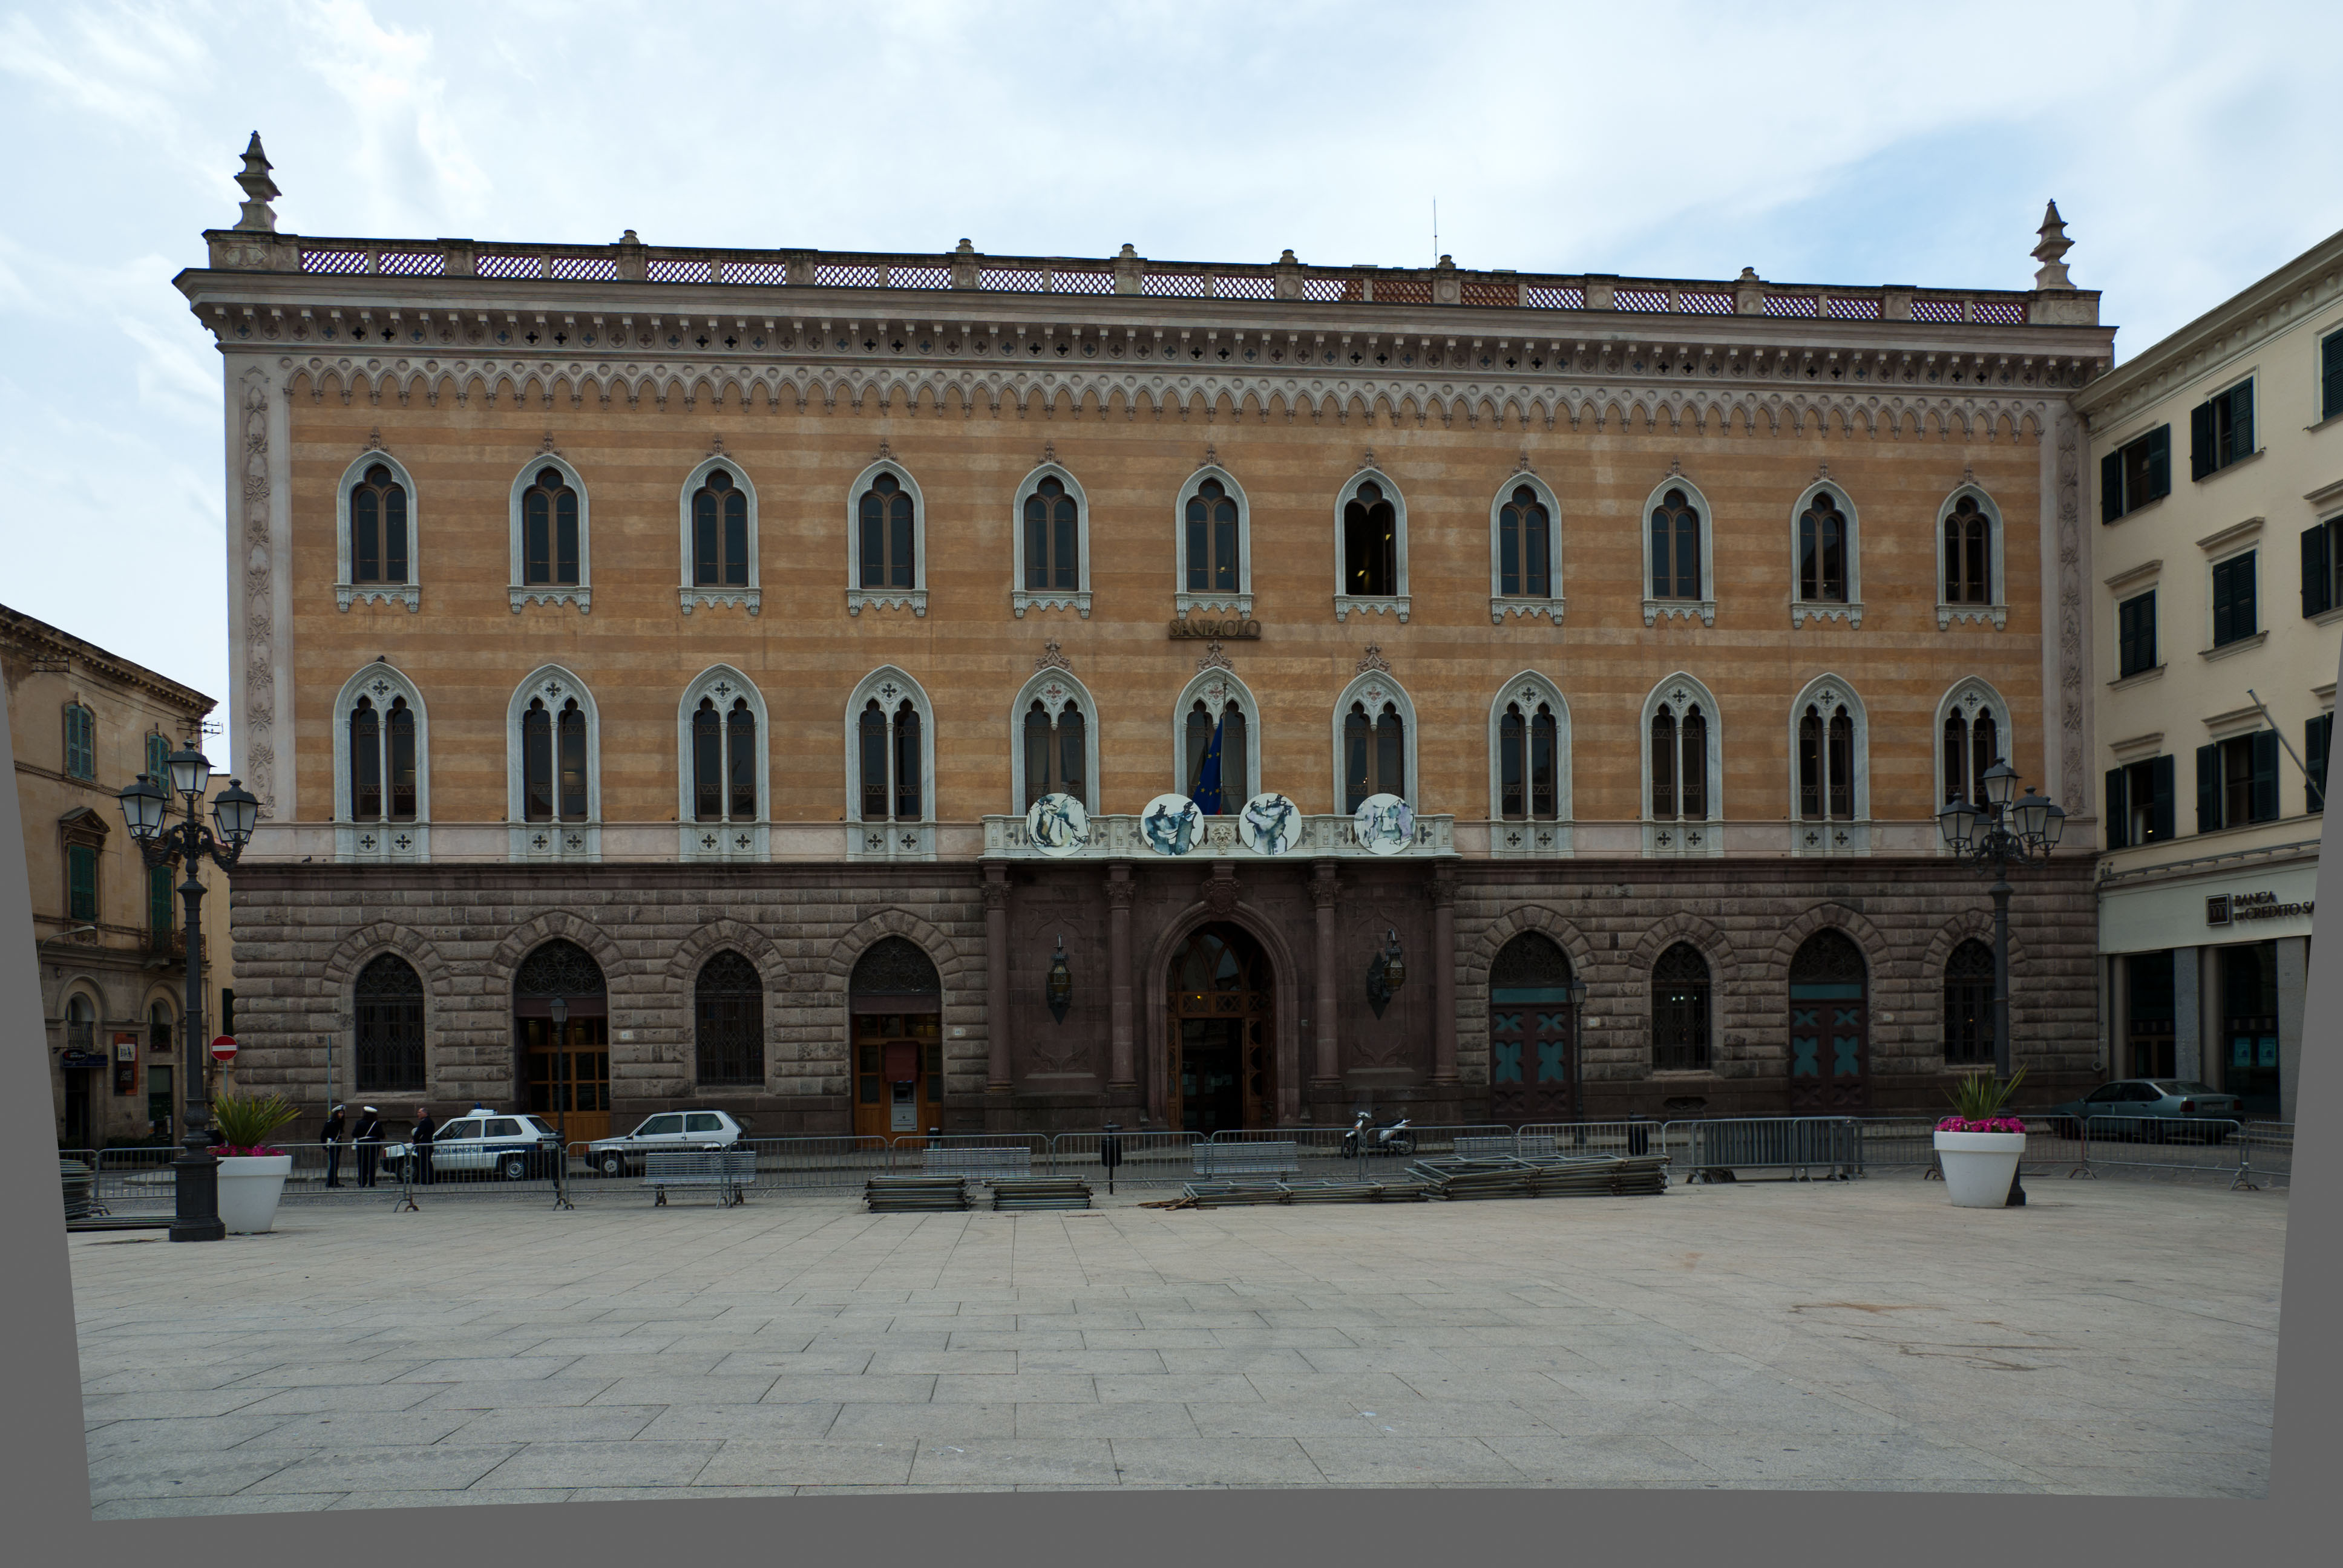 Ufficio Web Architetti Sassari : File:palazzo giordano sassari.jpg wikimedia commons